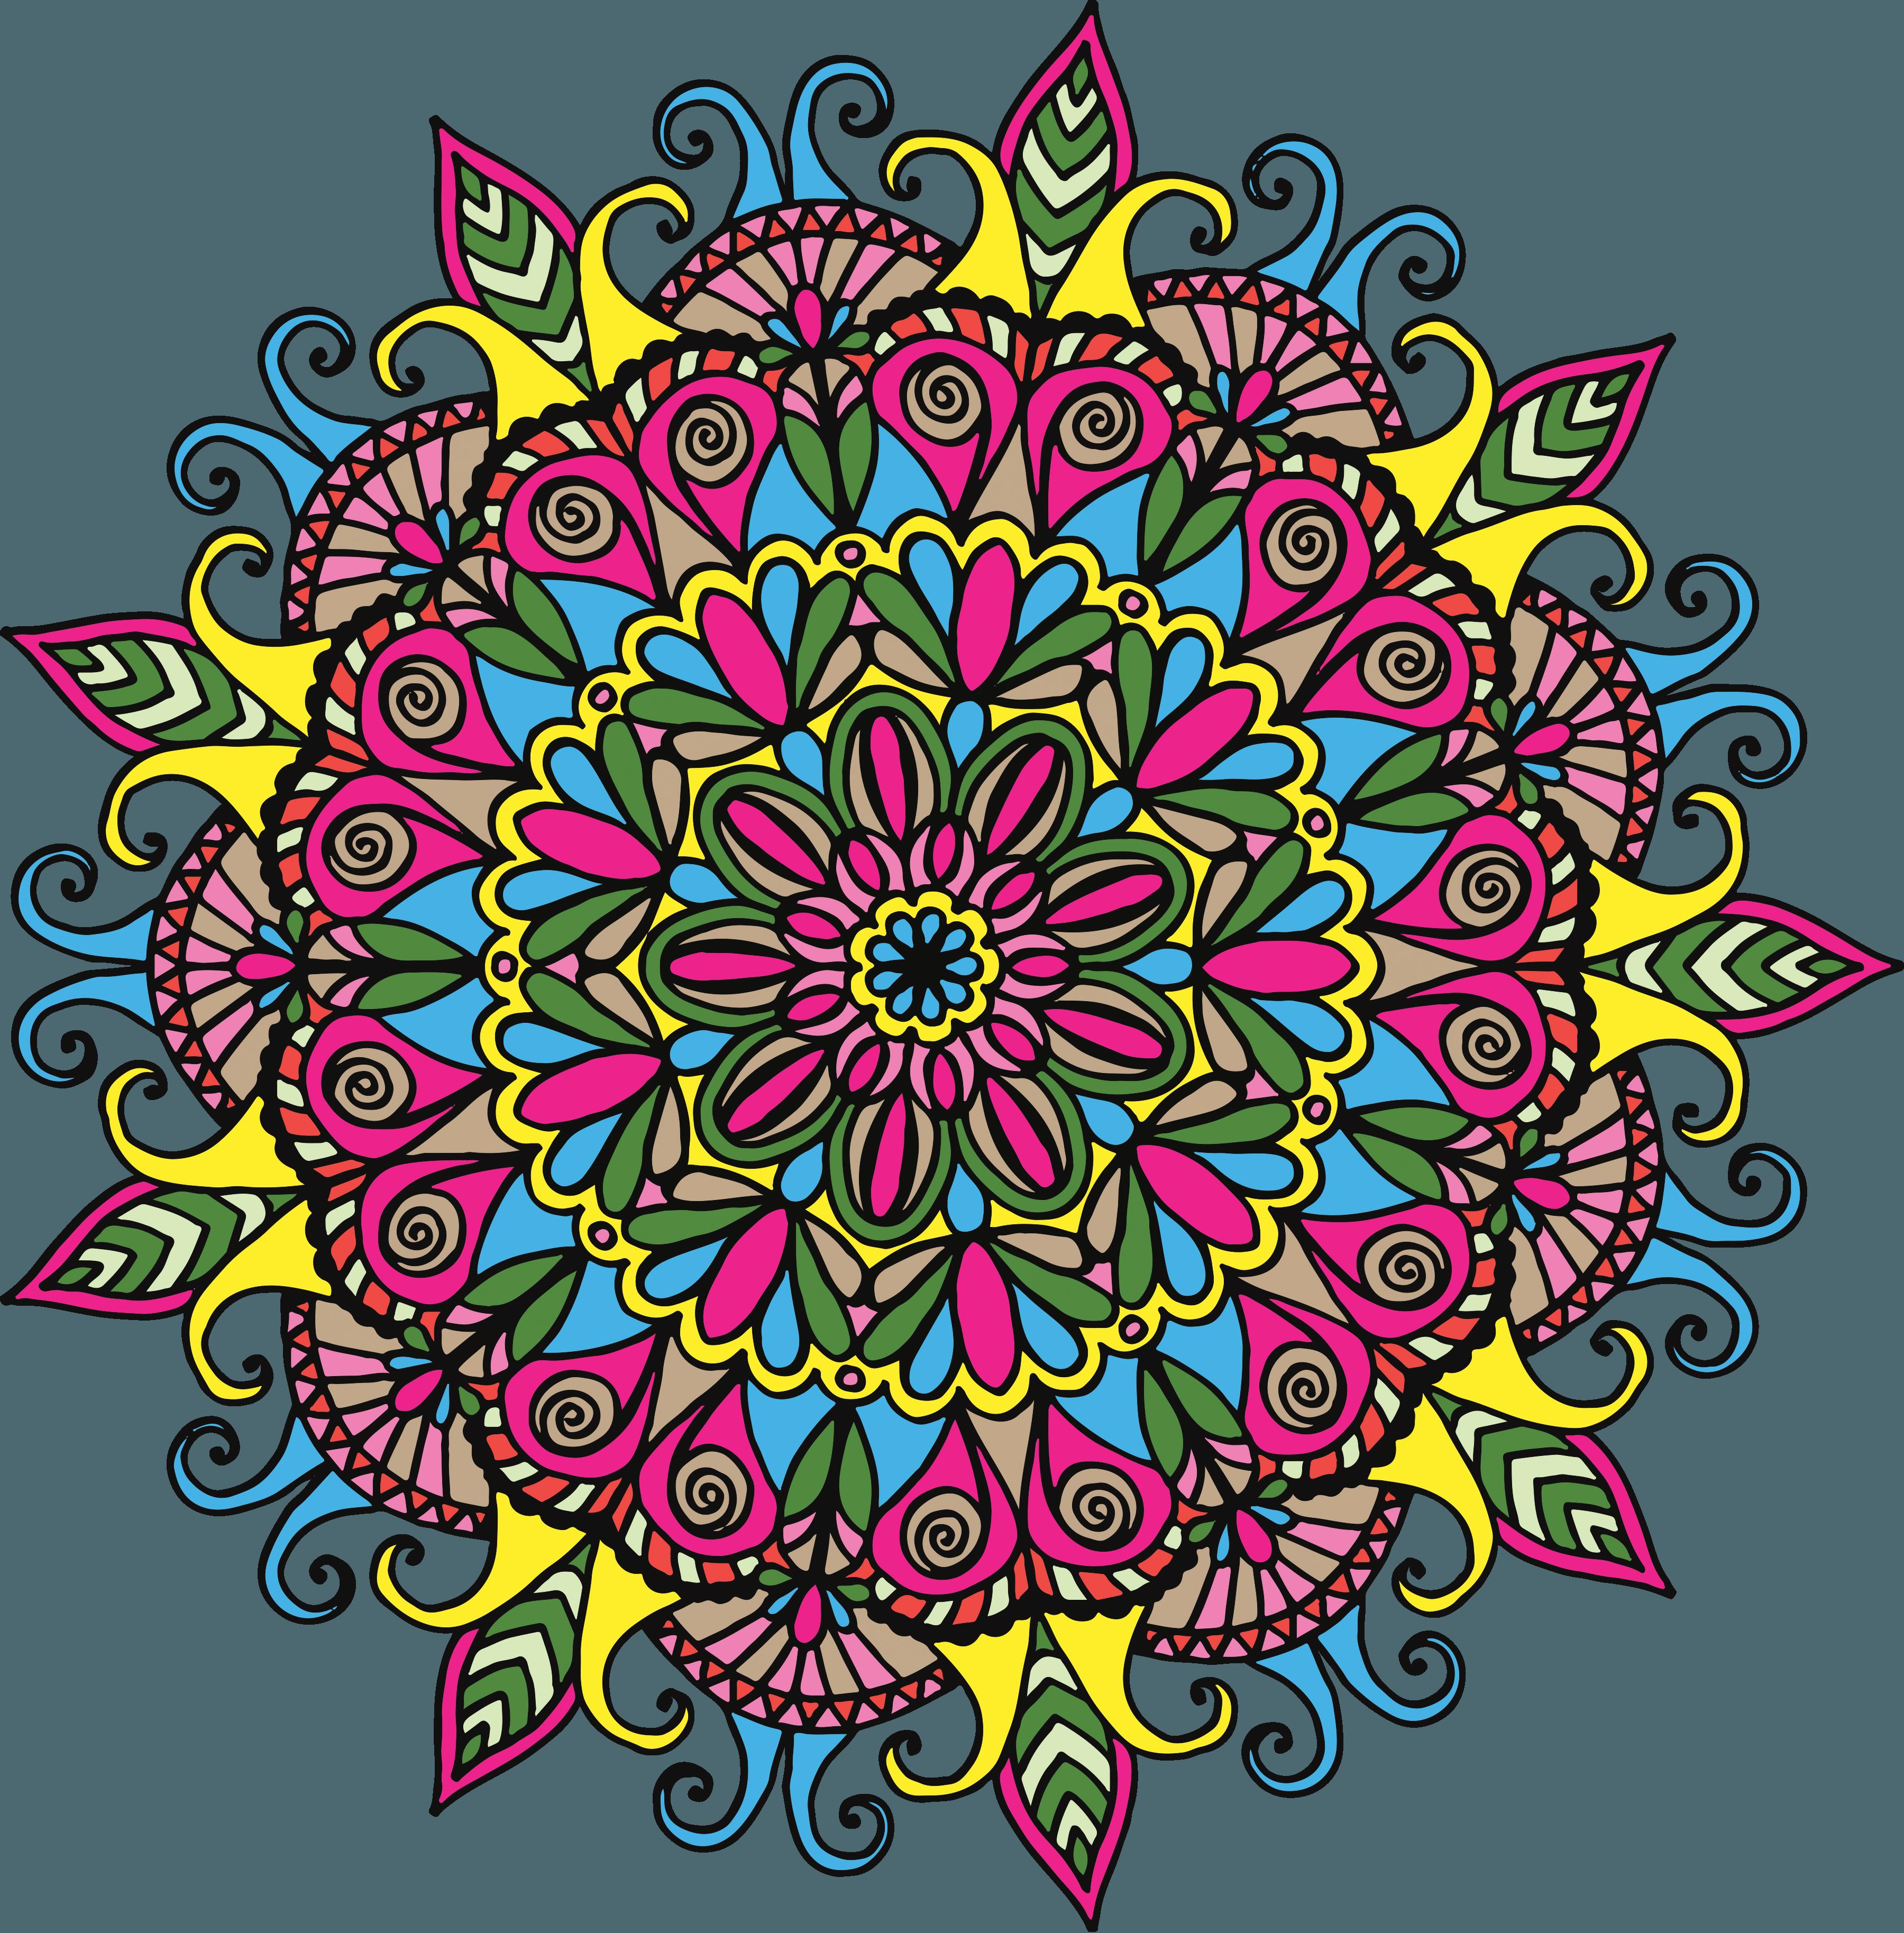 3600x3655 Freebie Commercial Use Hand Drawn Mandala Hg Designs